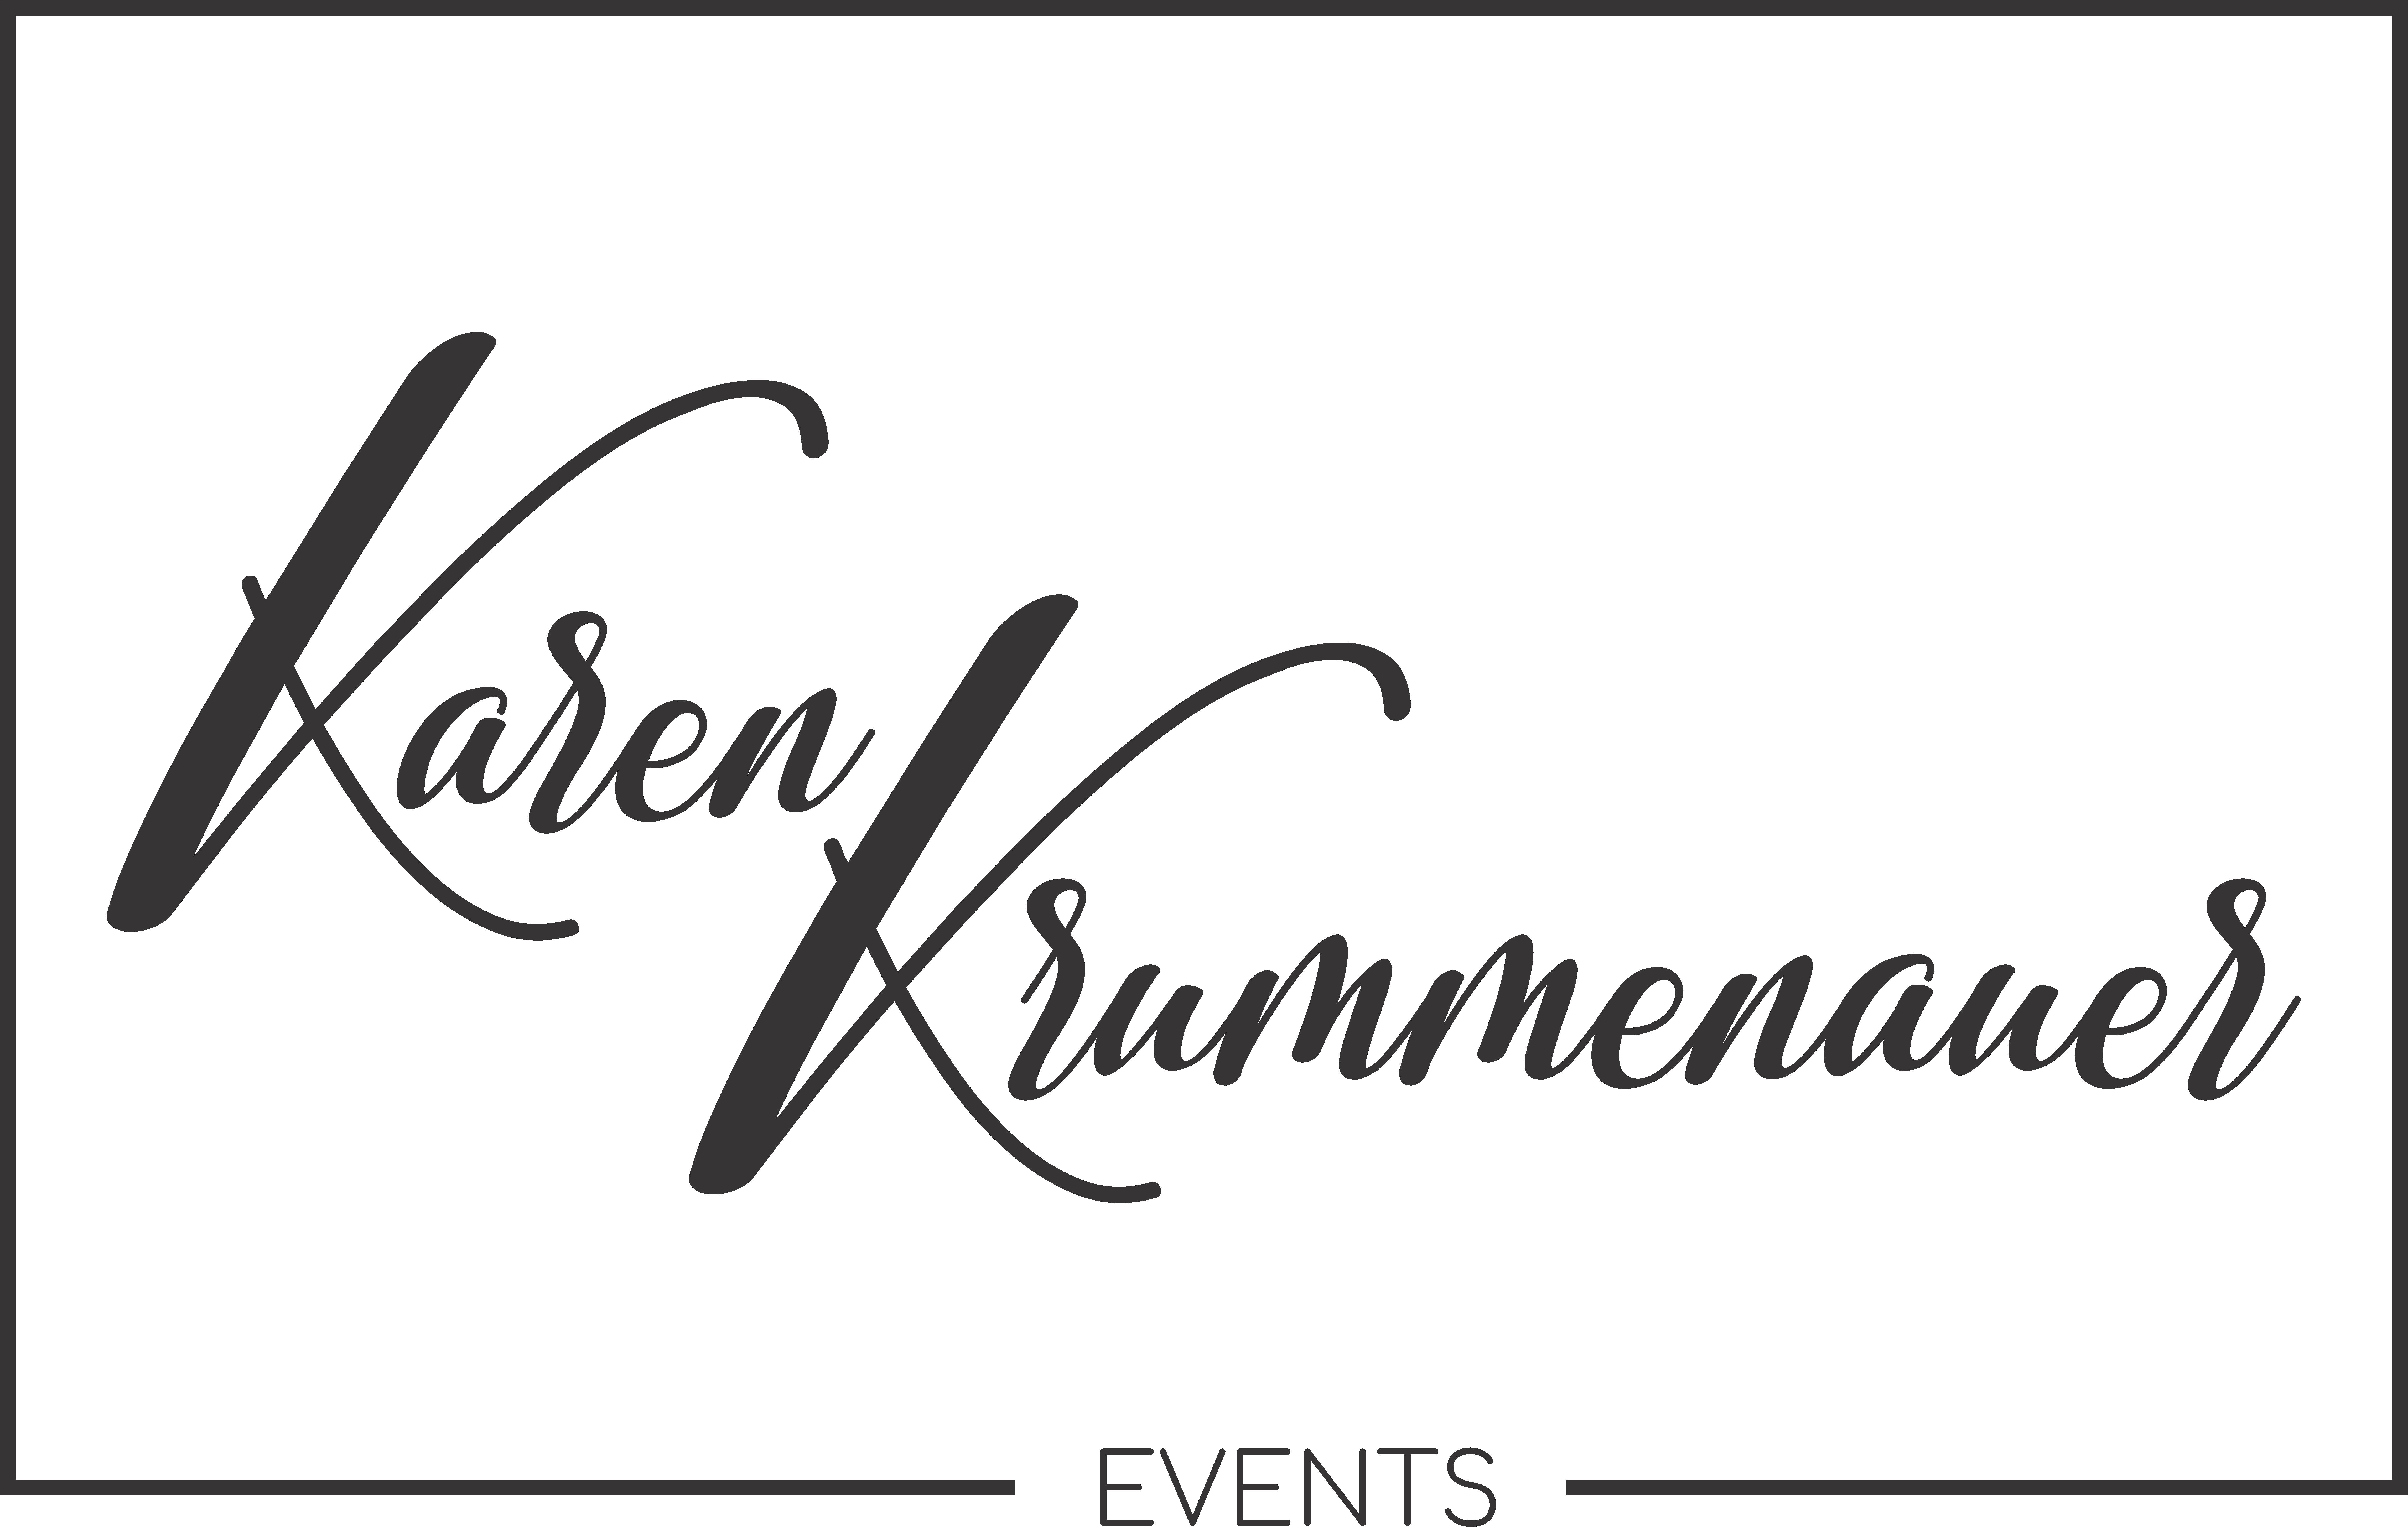 KAREN KRUMMENAUER EVENTS_MARCA_PRETO.png